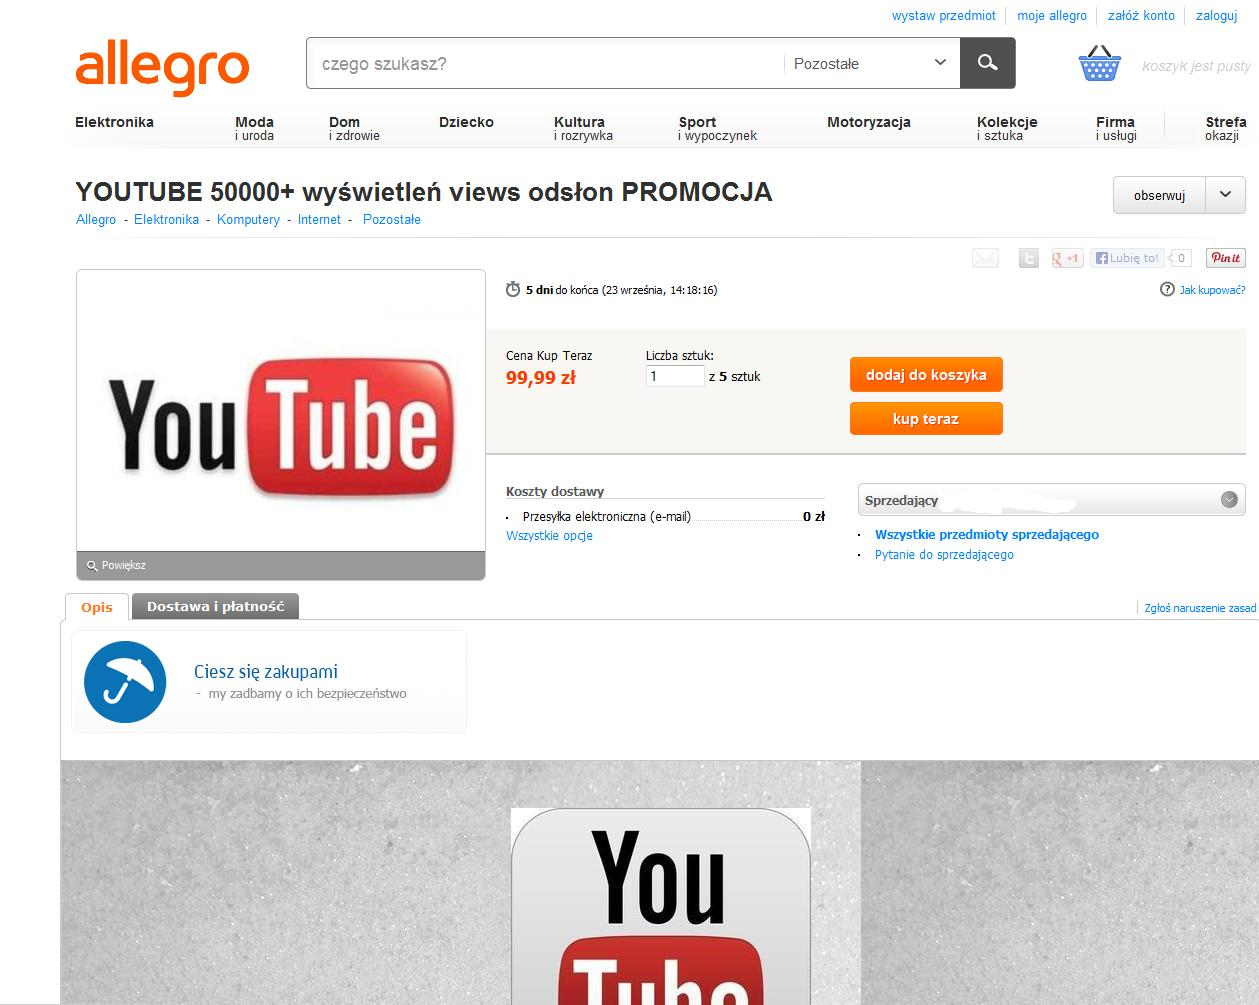 jak kupić licznik youtube?